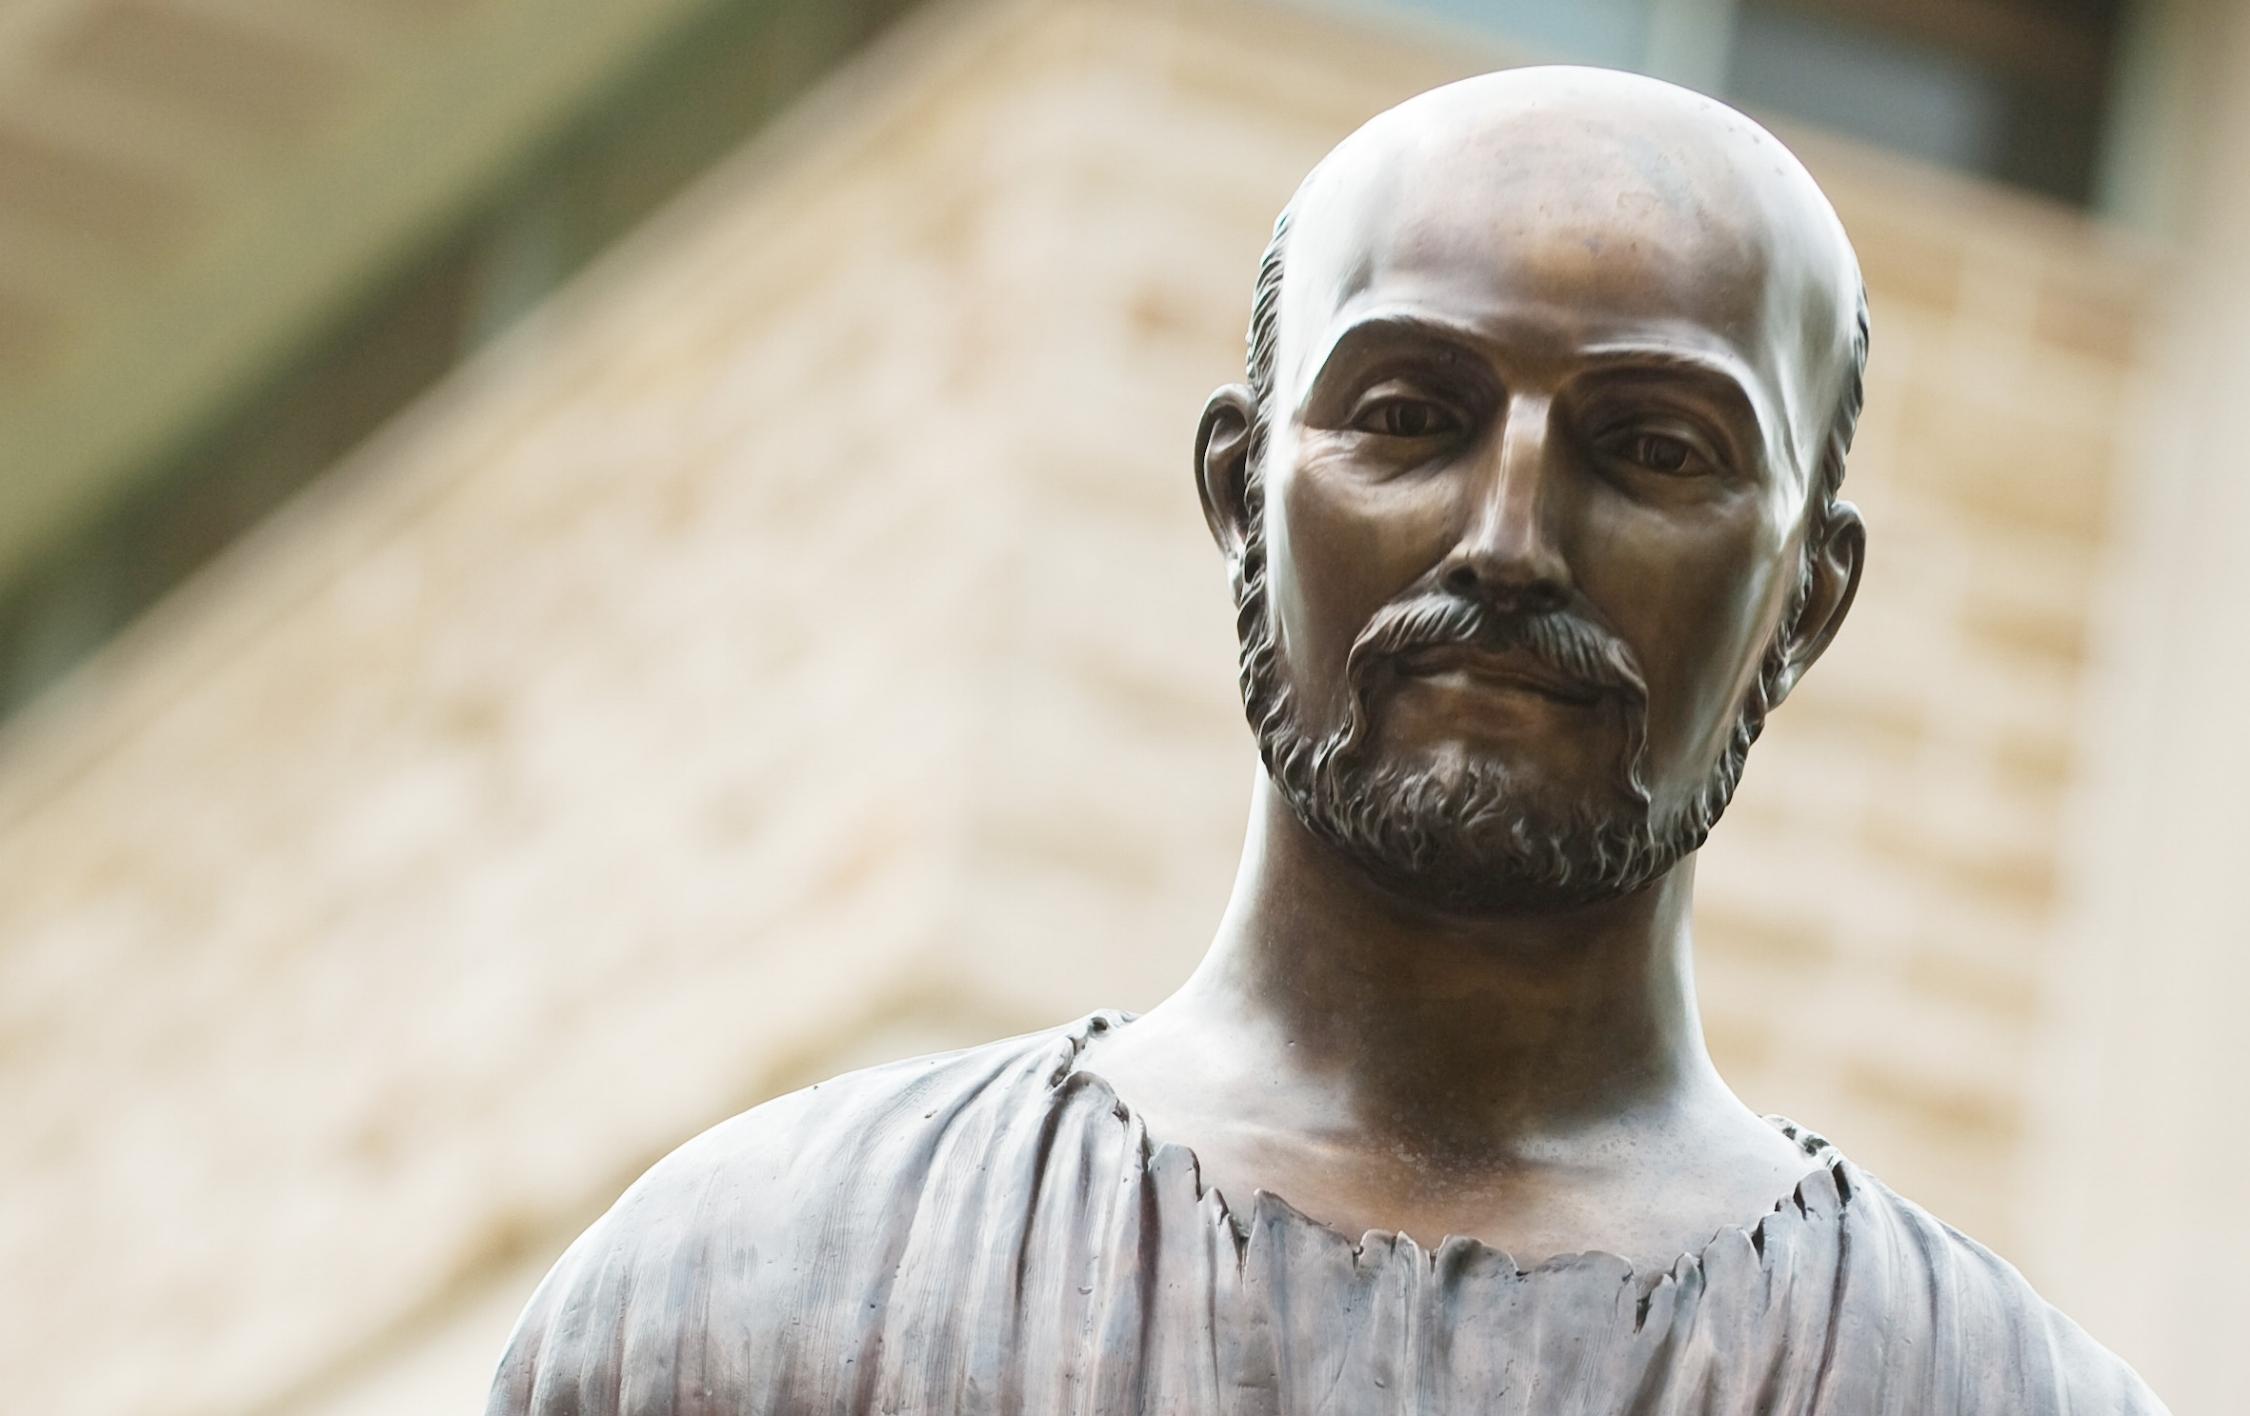 Statue of St. Ignatius Loyola (Photo by rockhurst University)